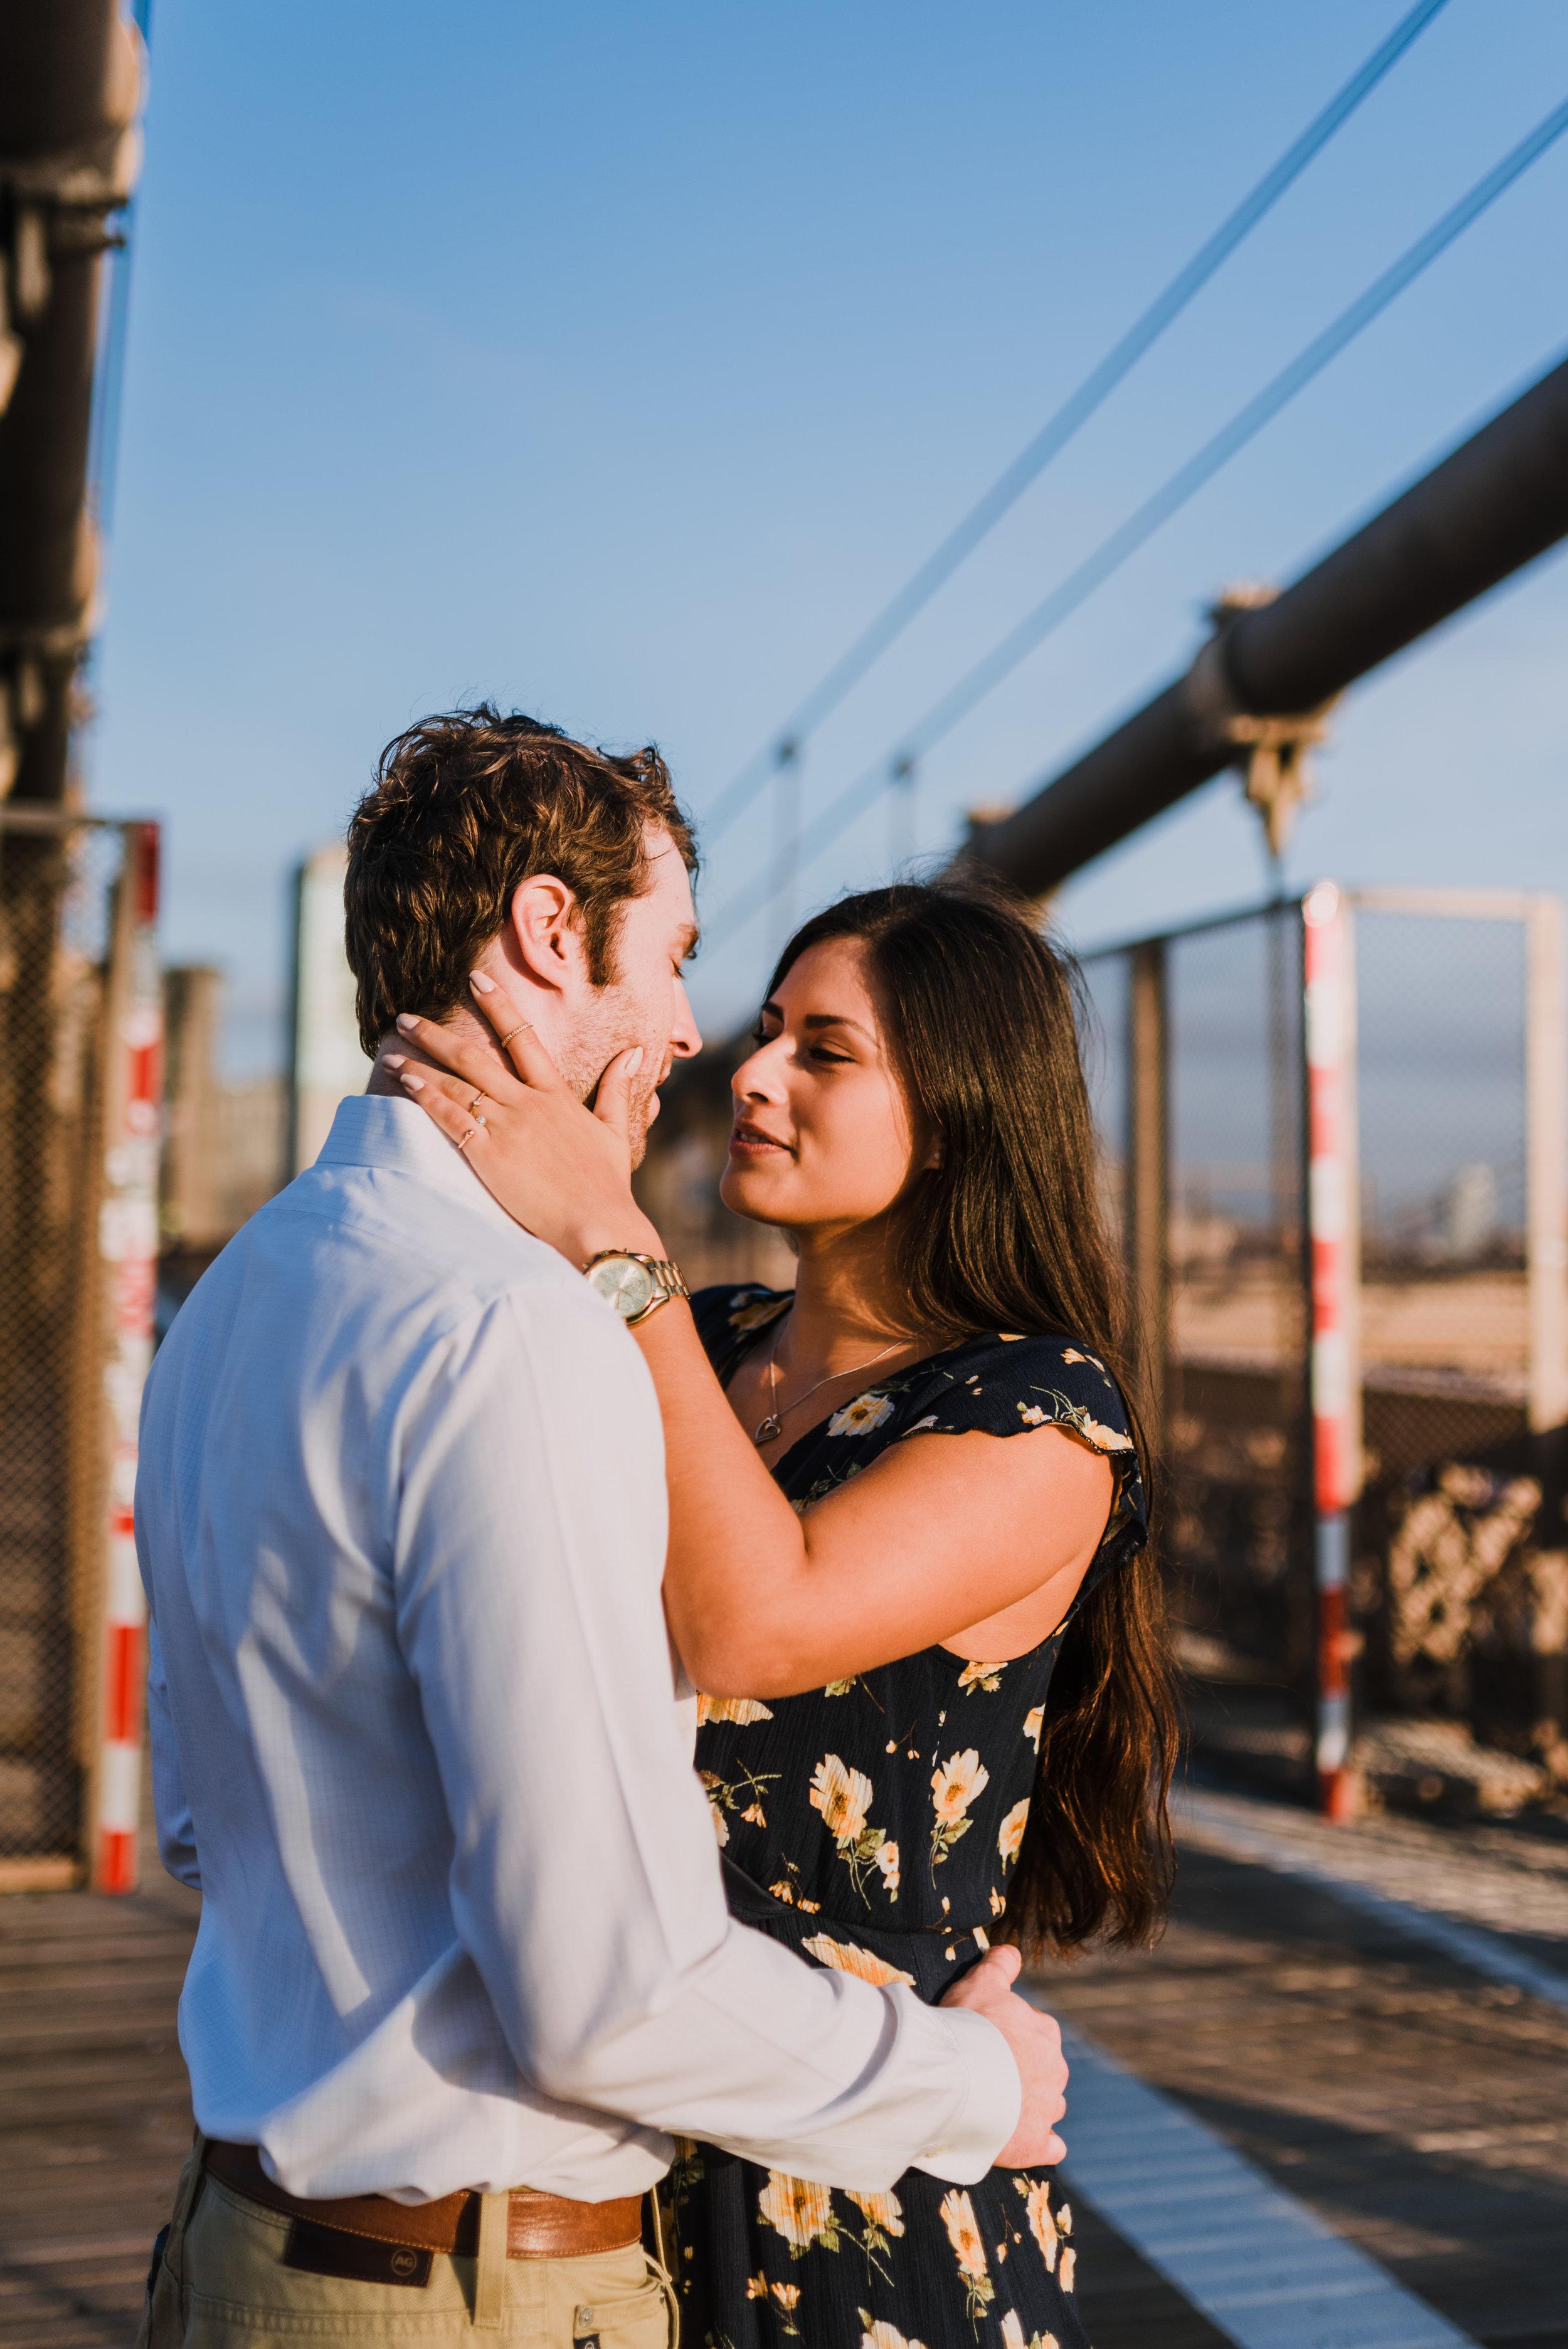 brooklyn bridge engagement shoot, couple shoot nyc, nyc wedding photographer, destination wedding photographer, documentary wedding photographer in nyc (20).jpg